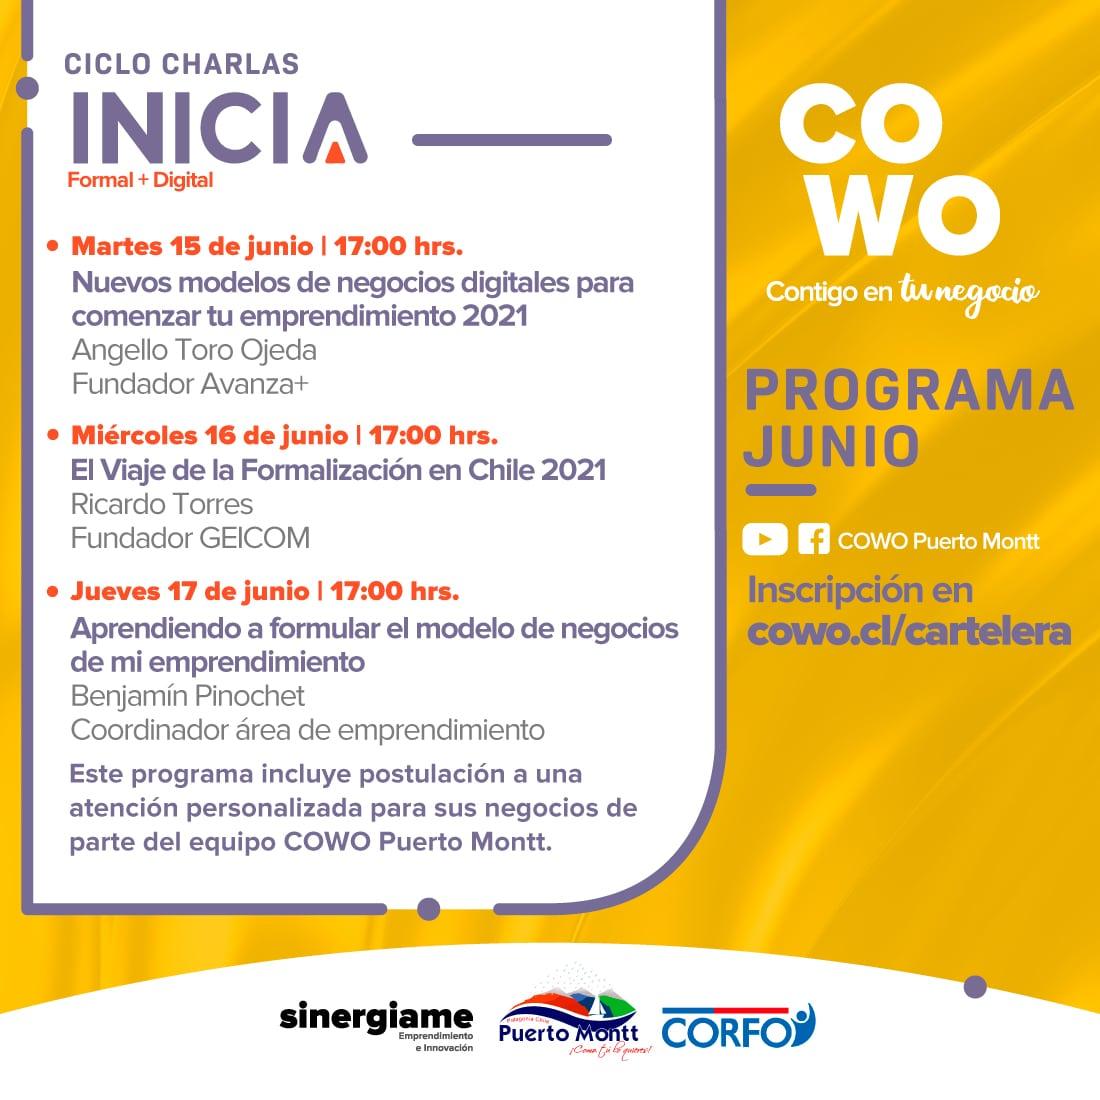 Programa Inicia: +Formal +Digital Junio 2021